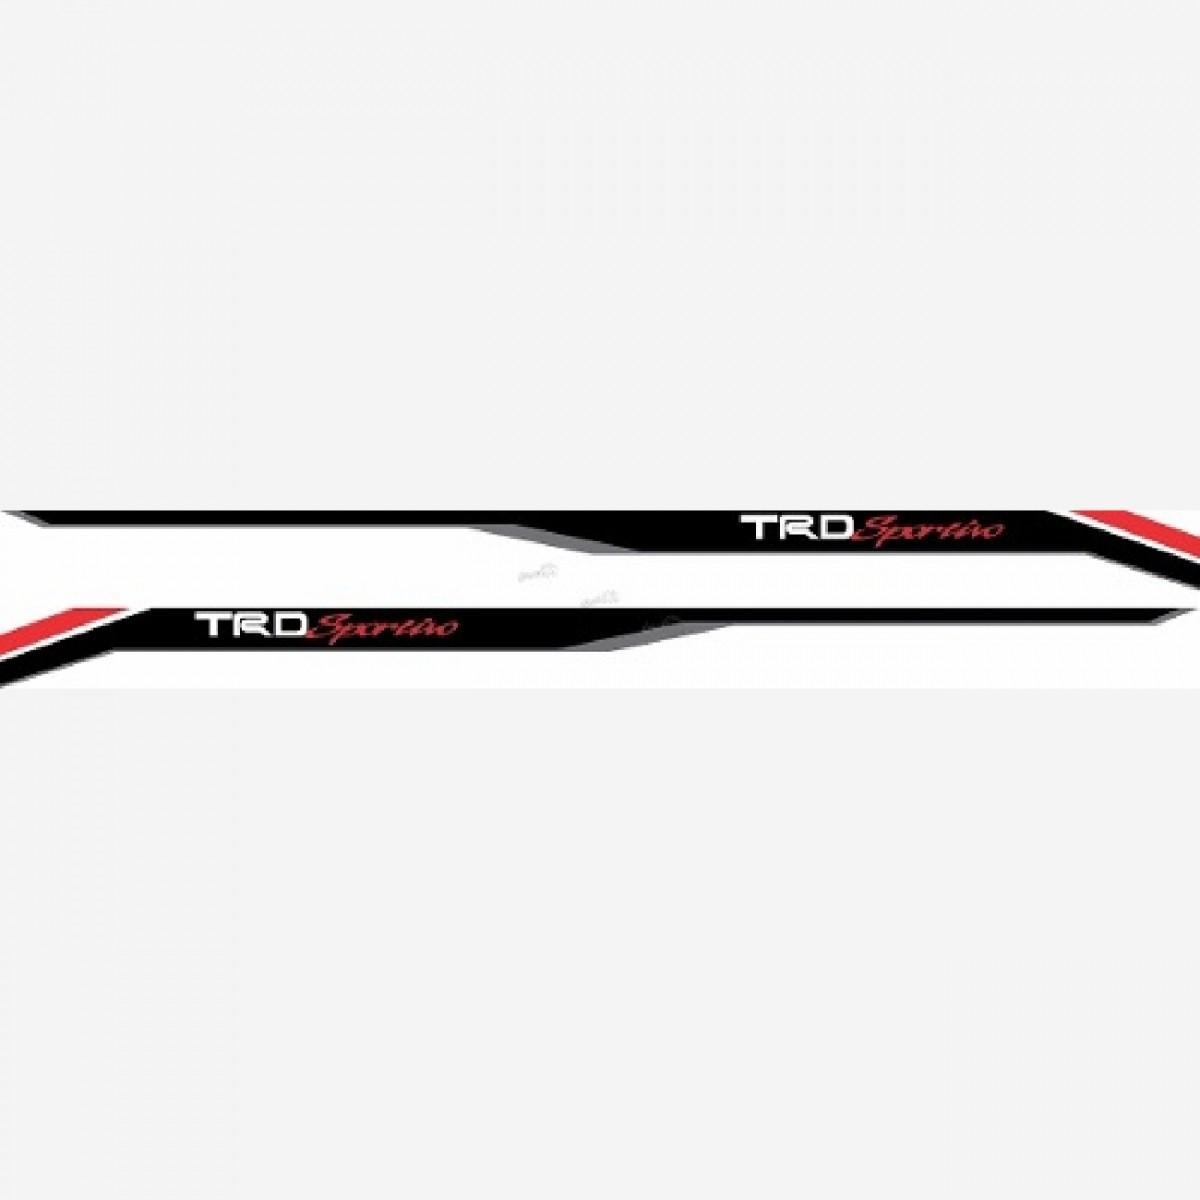 Adesivo Toyota Hilux 2016 Trd Sportivo Faixa Lateral Hl1616